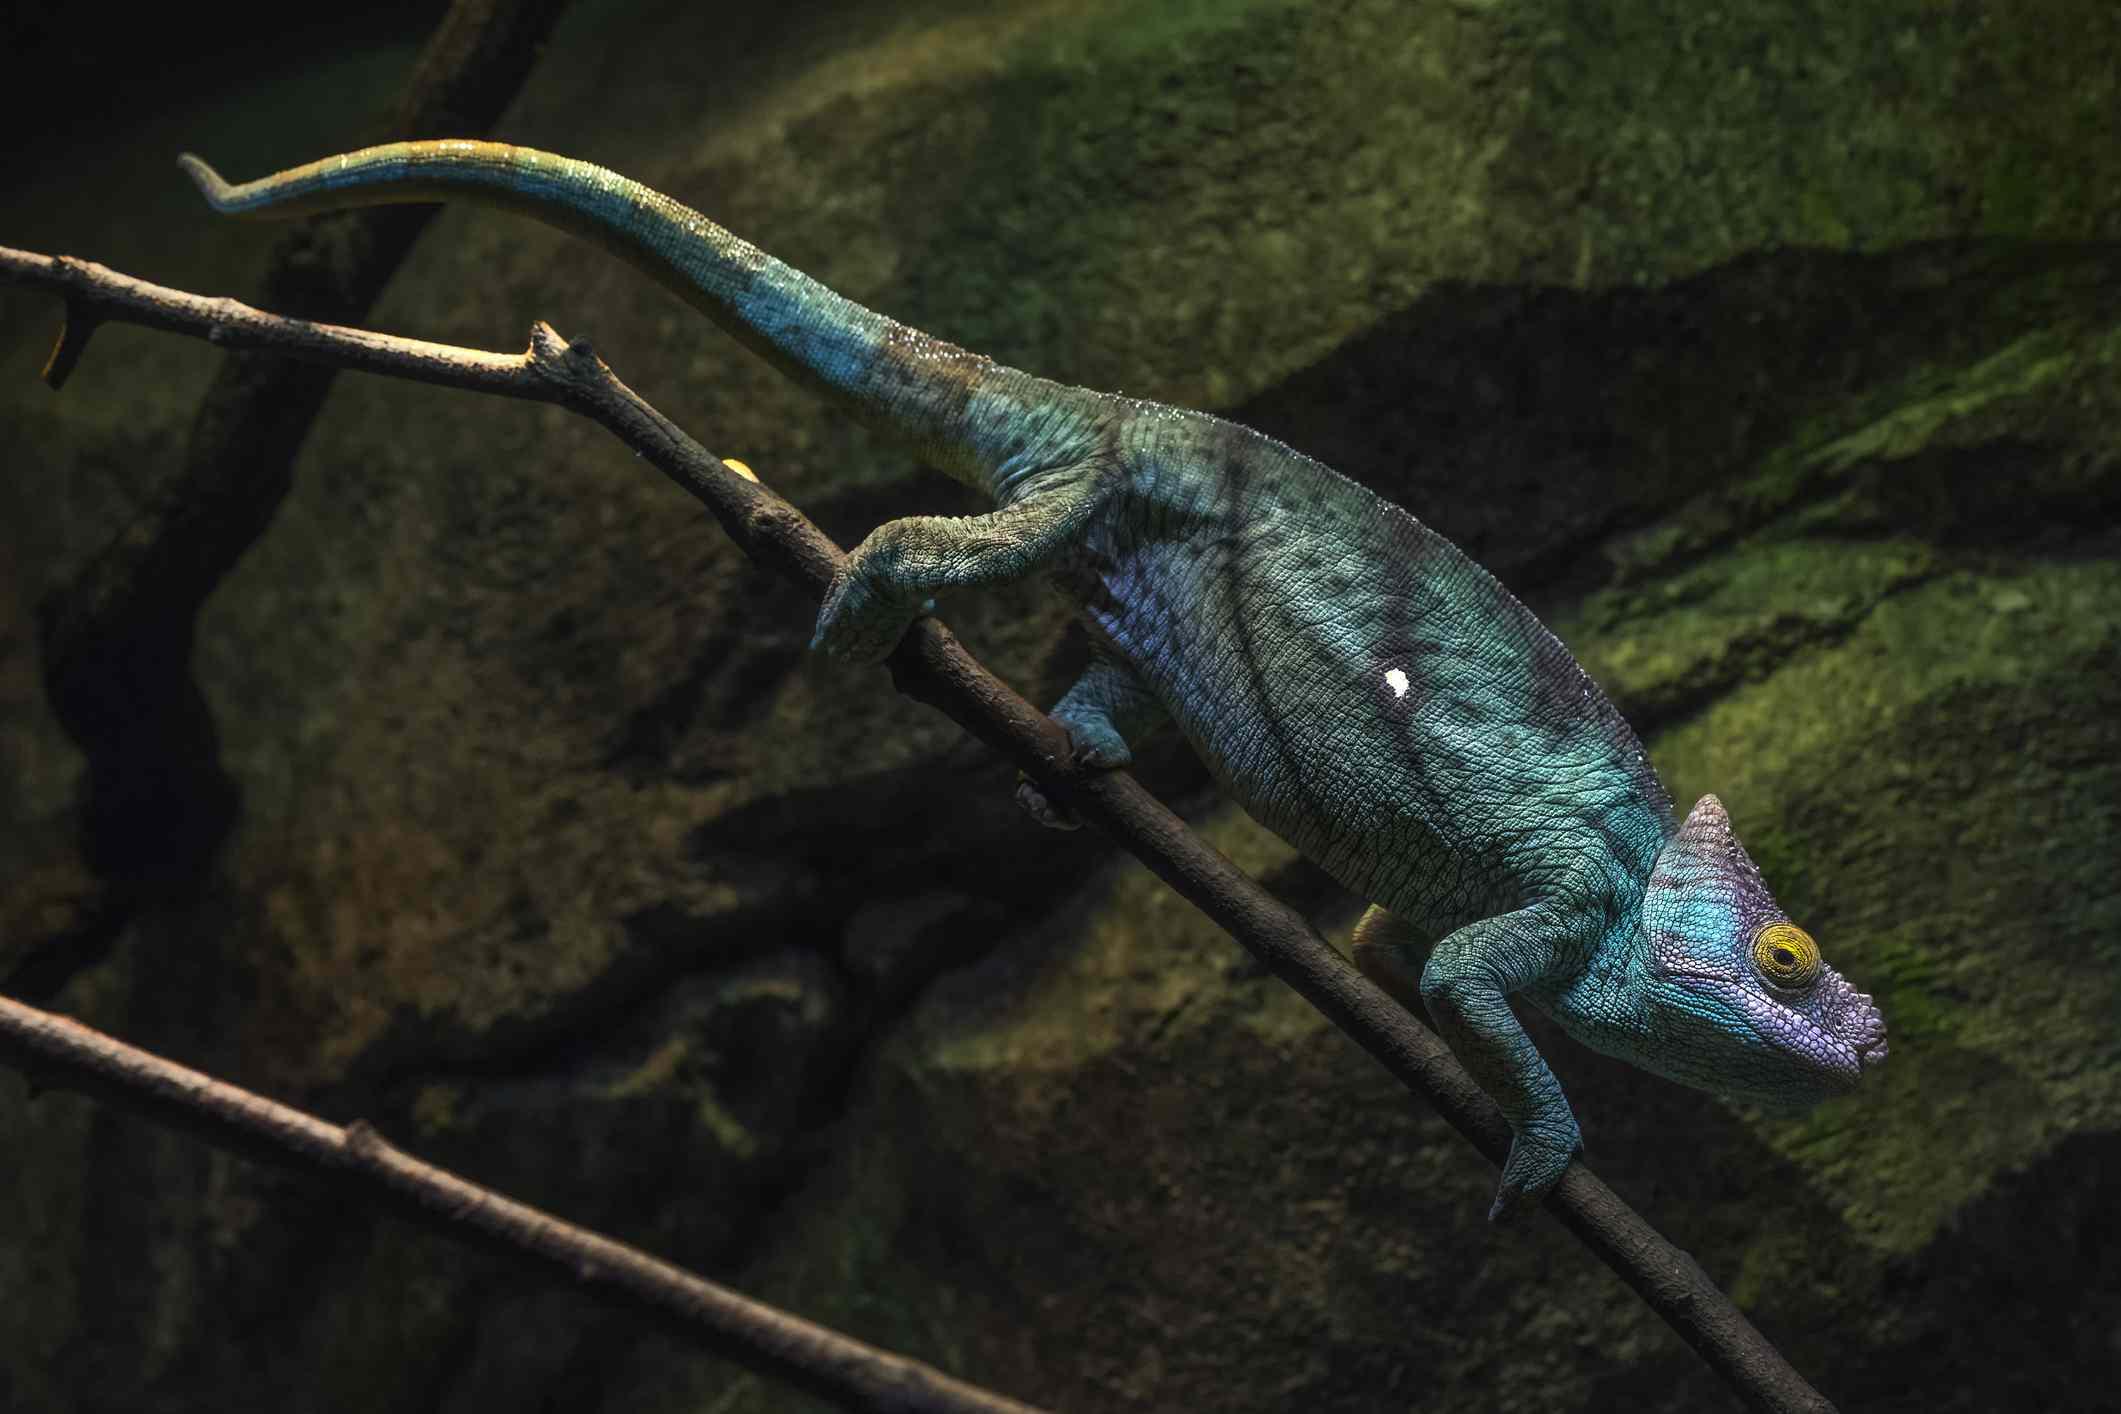 Parson's chameleon walking on branch at night